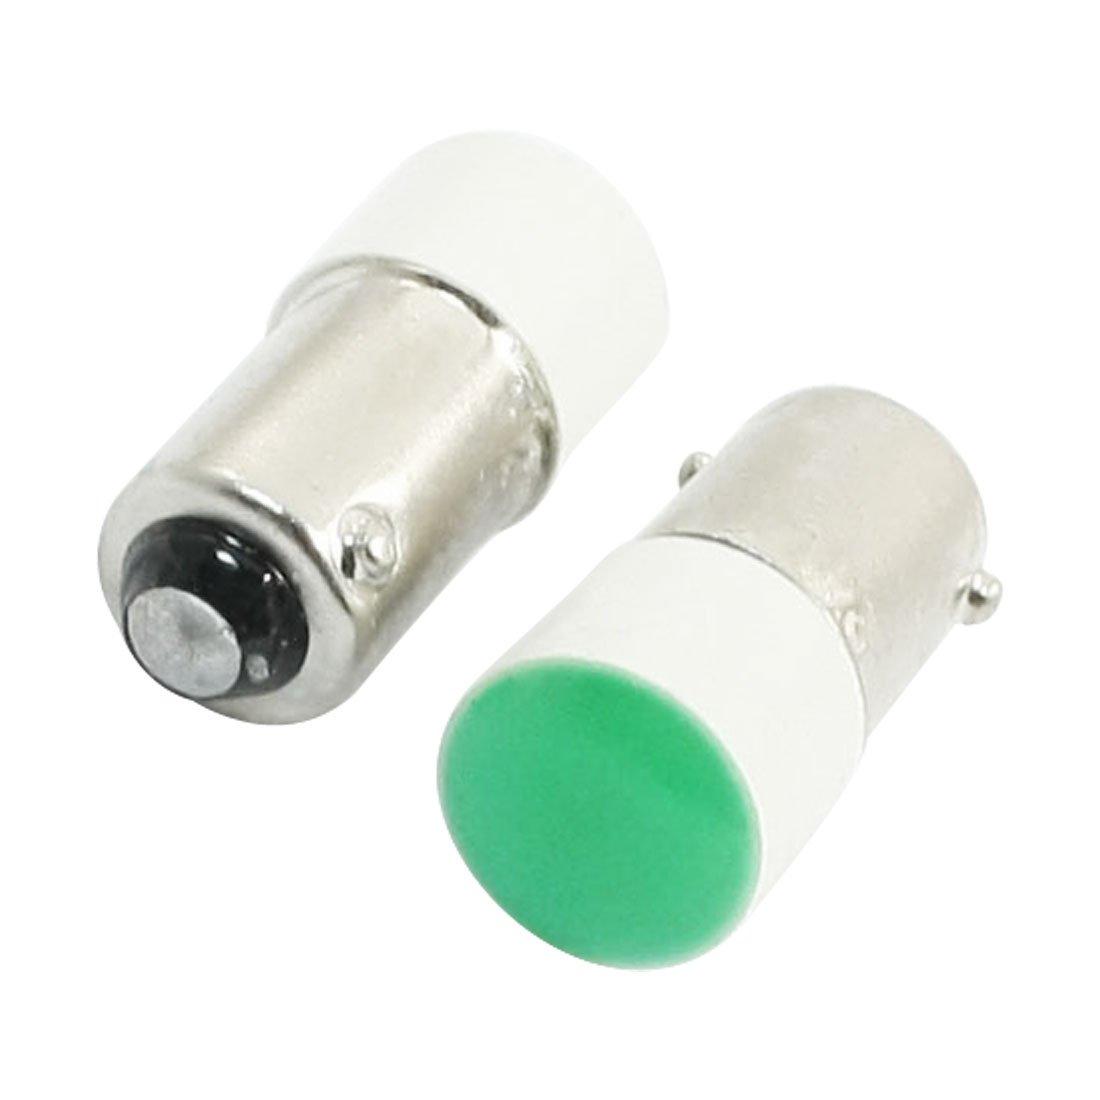 2BA9S Vert clair Accident indicateur LED Signal pilote Lampe 24V 5A Sourcingmap a14010900ux0989